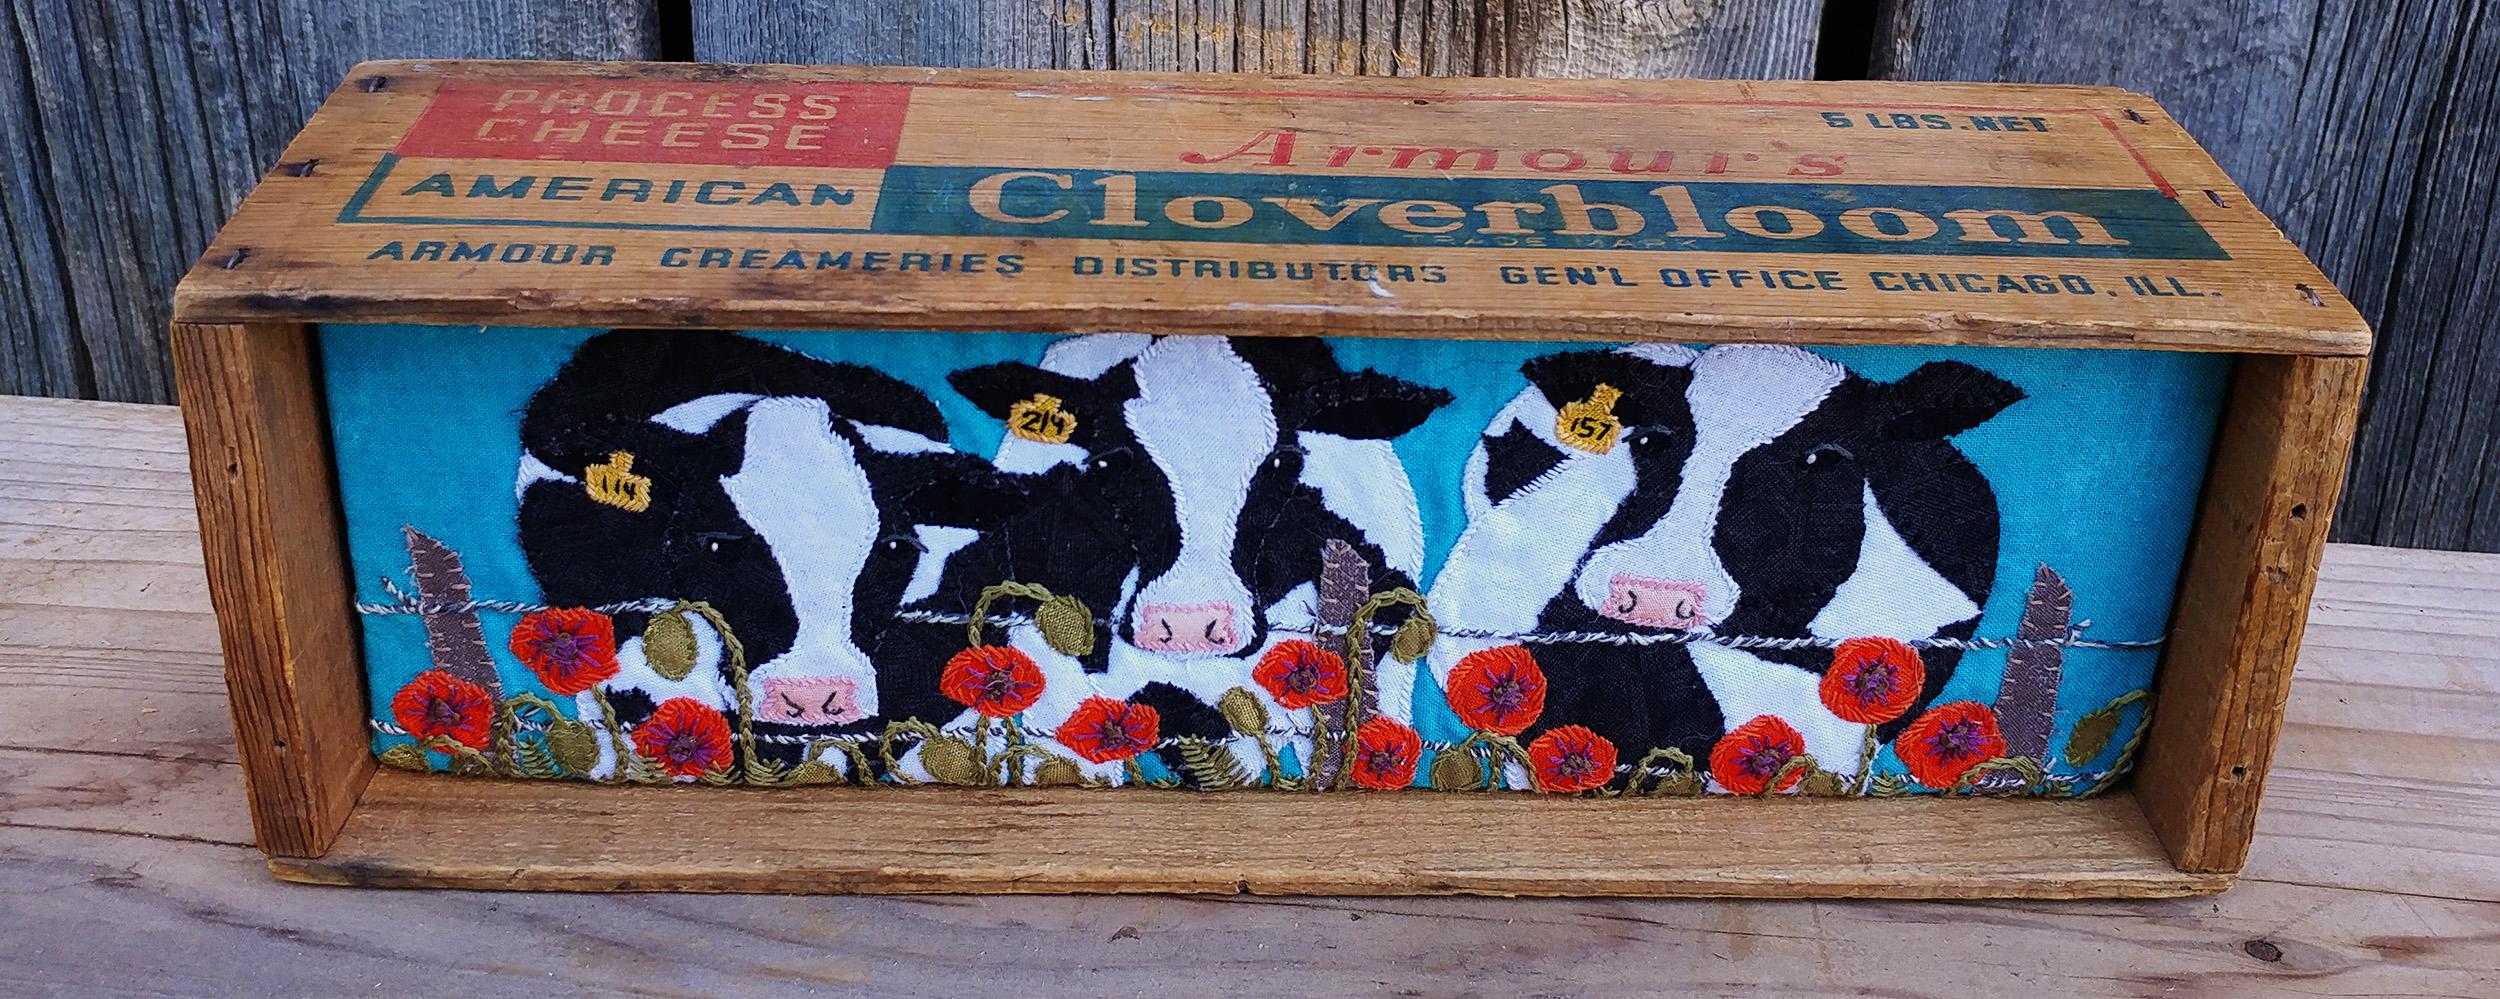 cowinpoppies_cheesebox0008.jpg